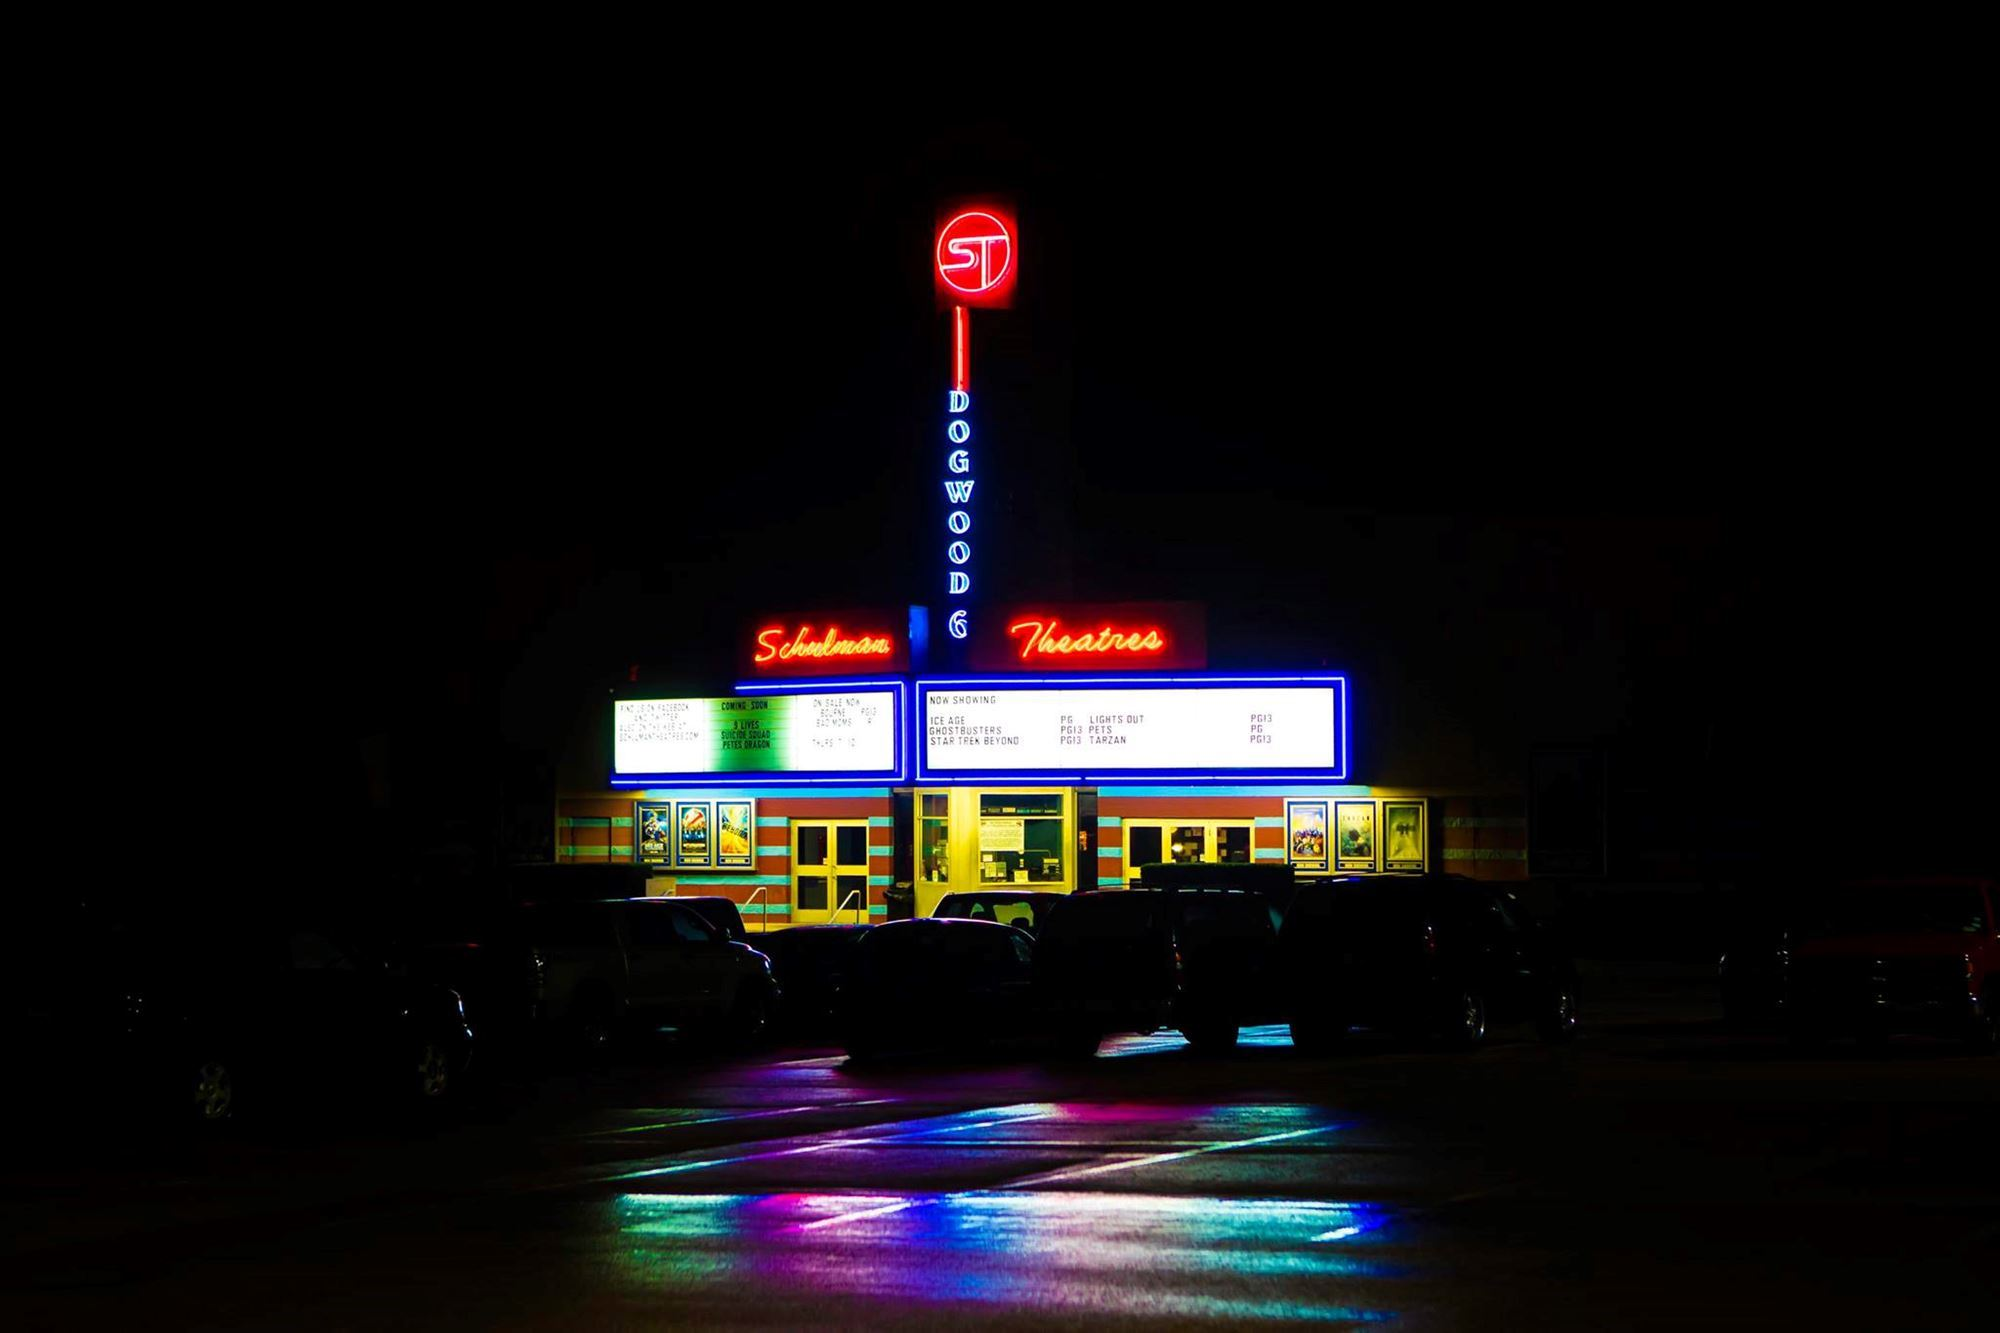 City Lights Schulman Theater